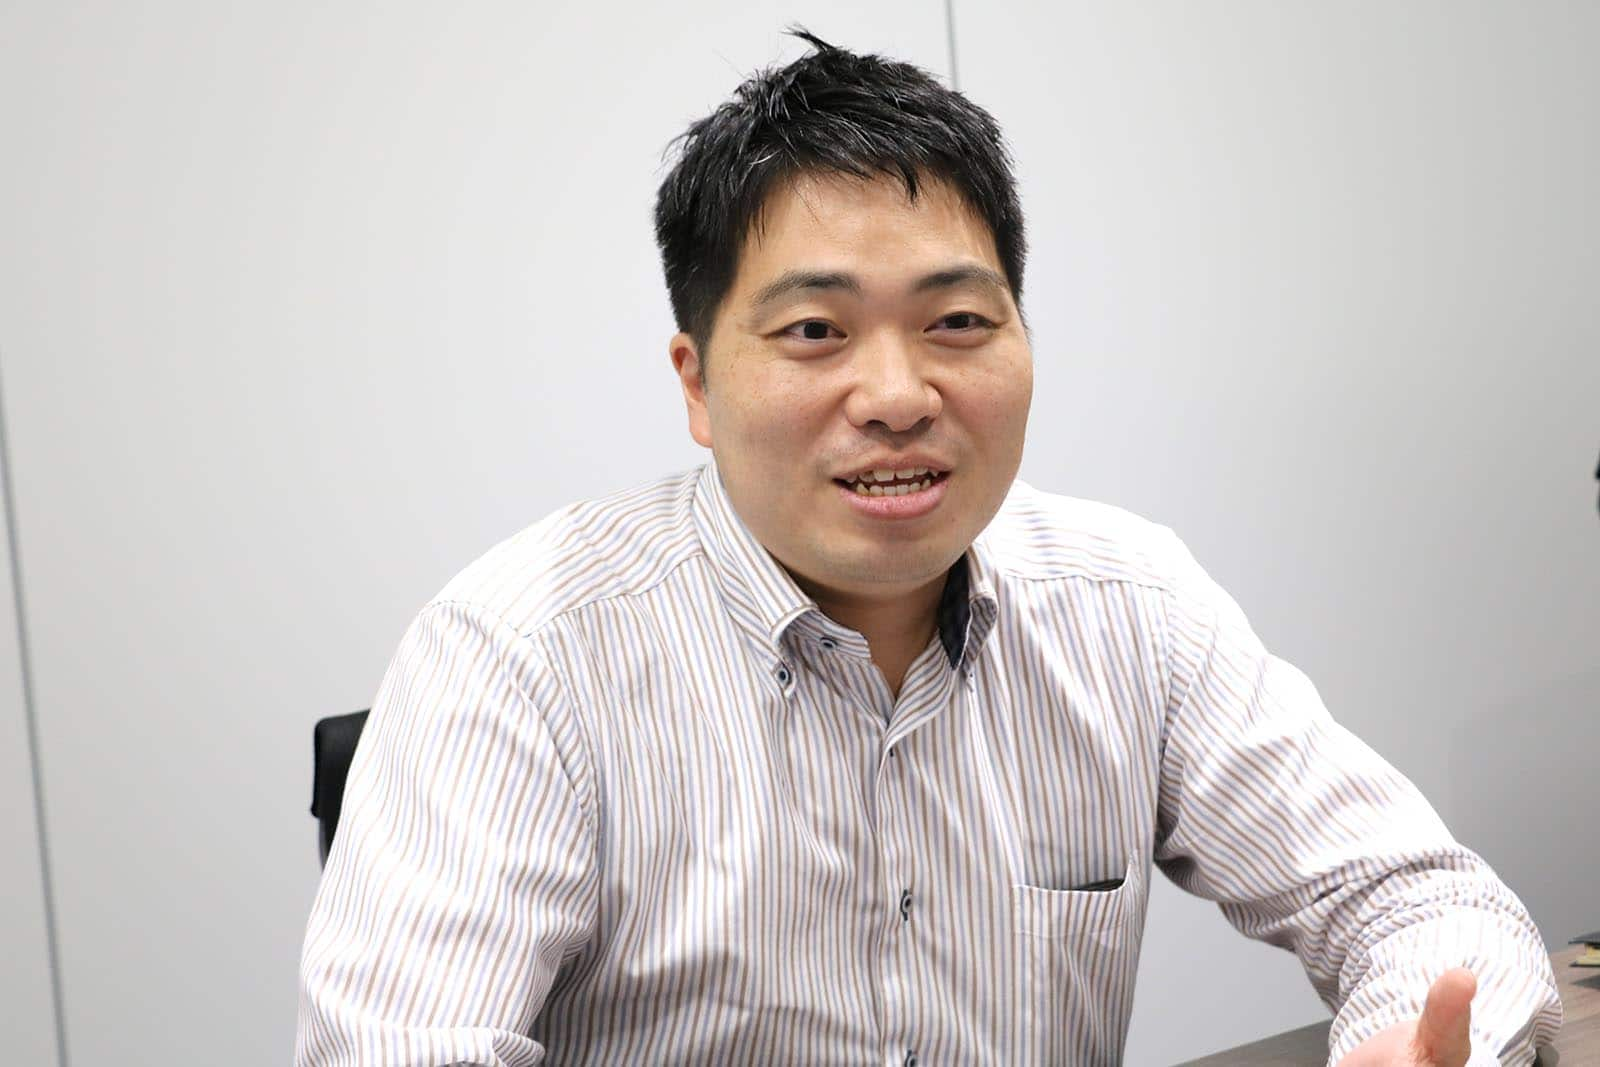 株式会社富士キメラ総研 第二部門 花棚 洋 氏